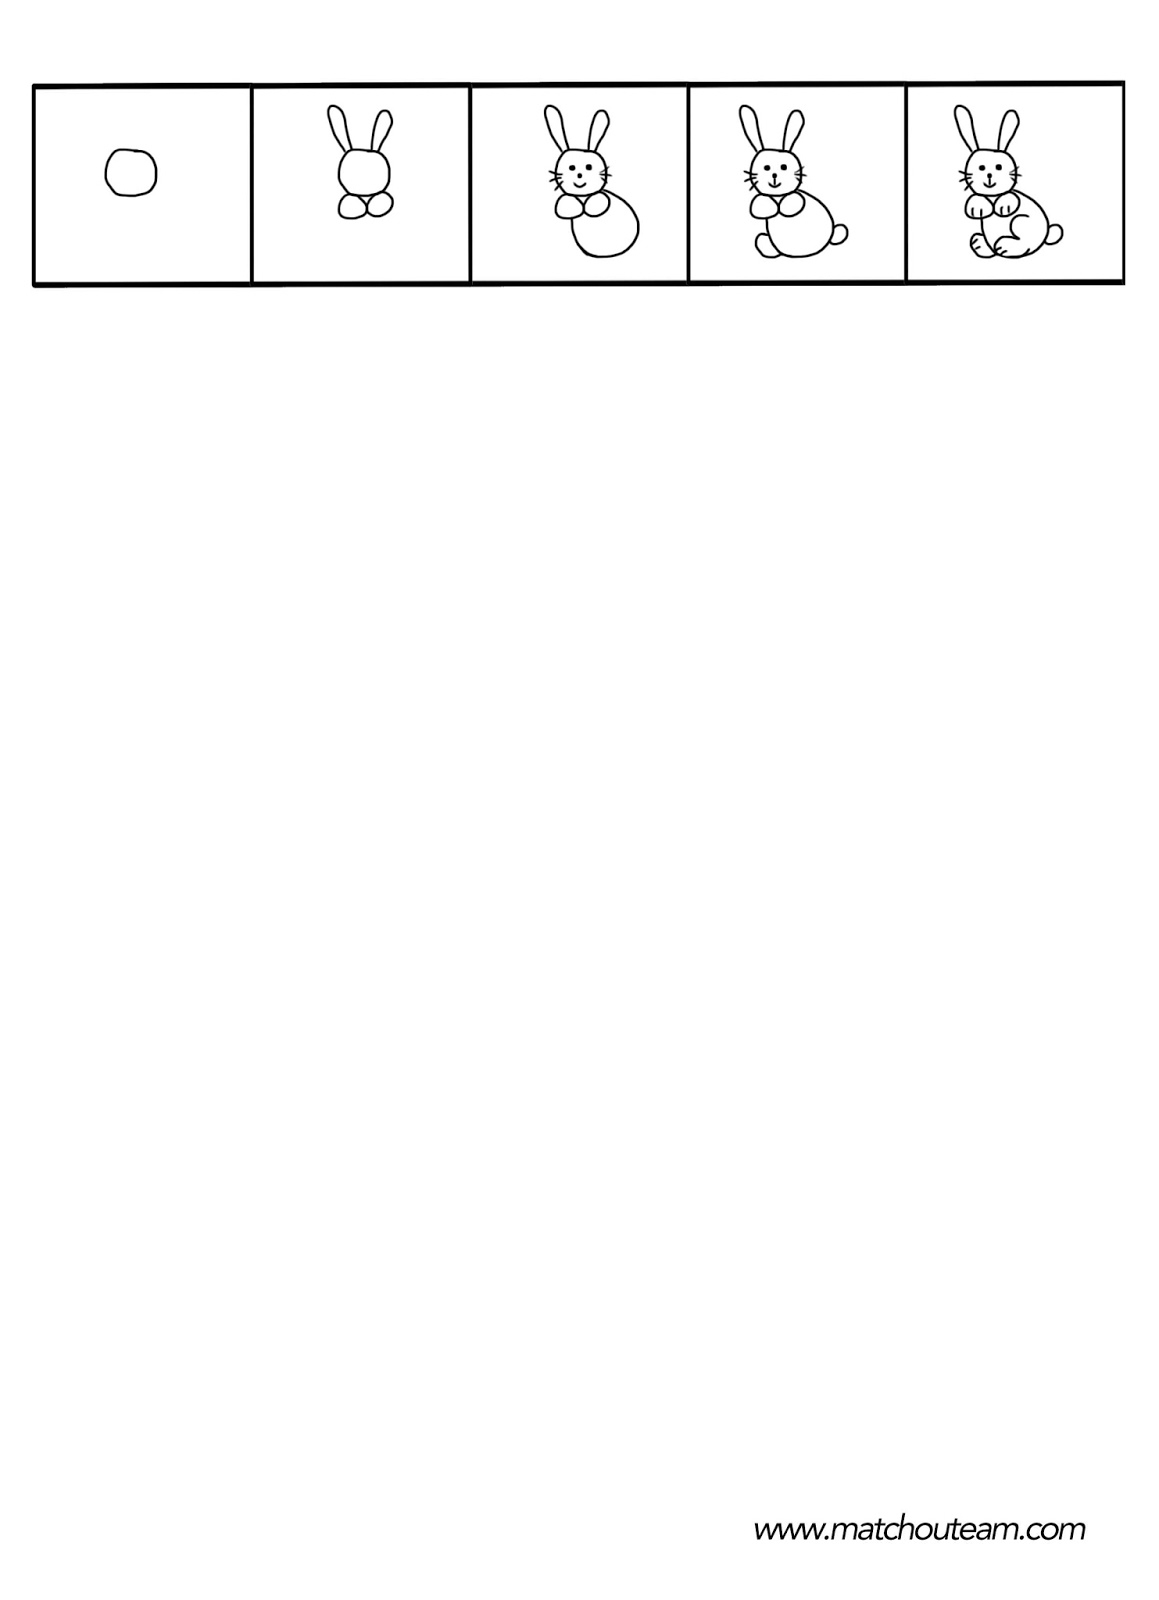 Sehr Ma Tchou team: Fiches de dessins dirigés NR01